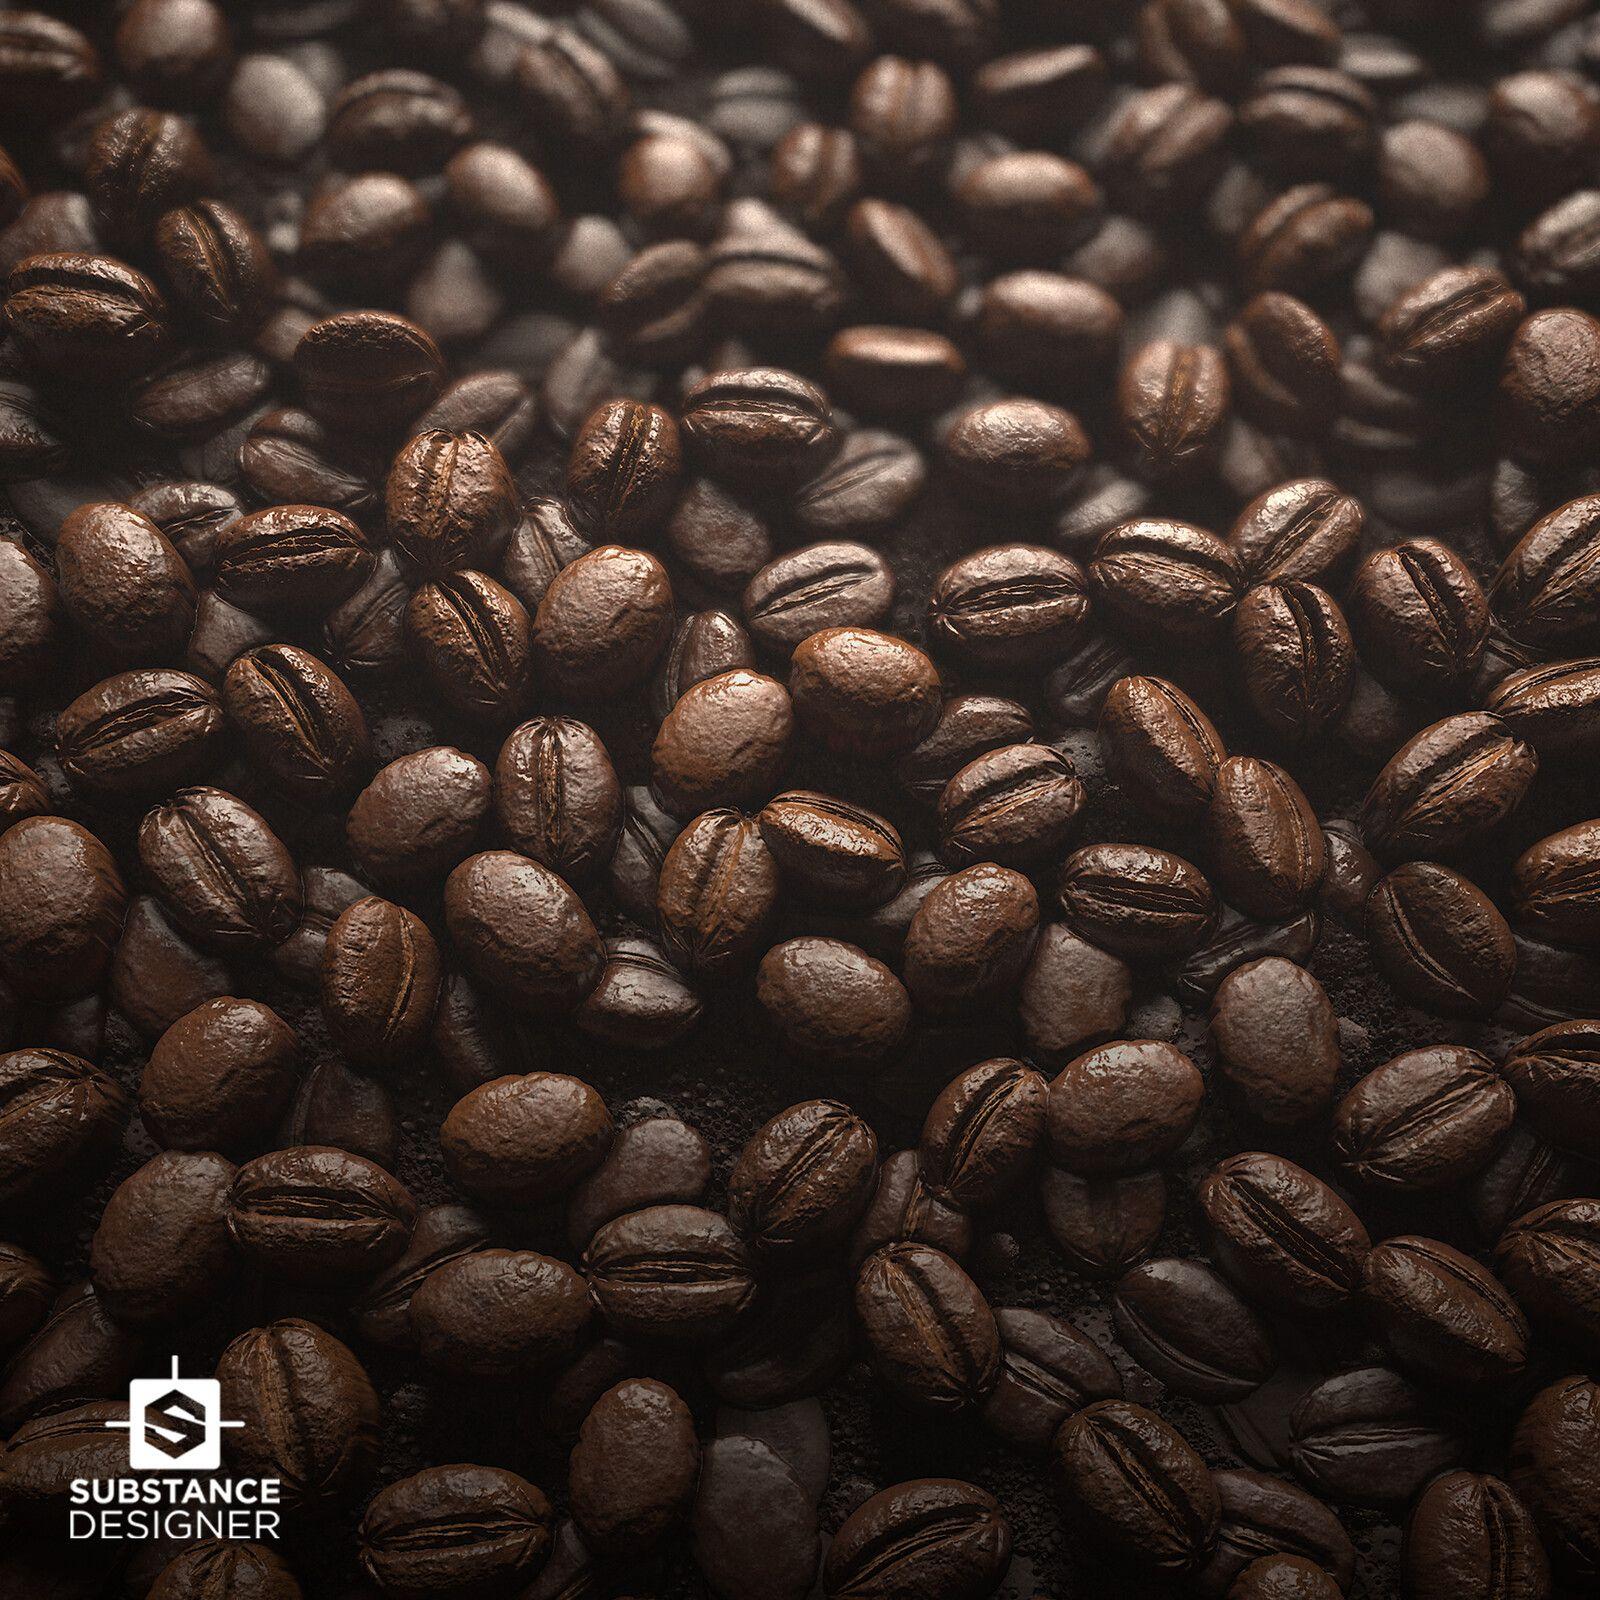 Coffee Bean Material, Peyton Varney on ArtStation at https